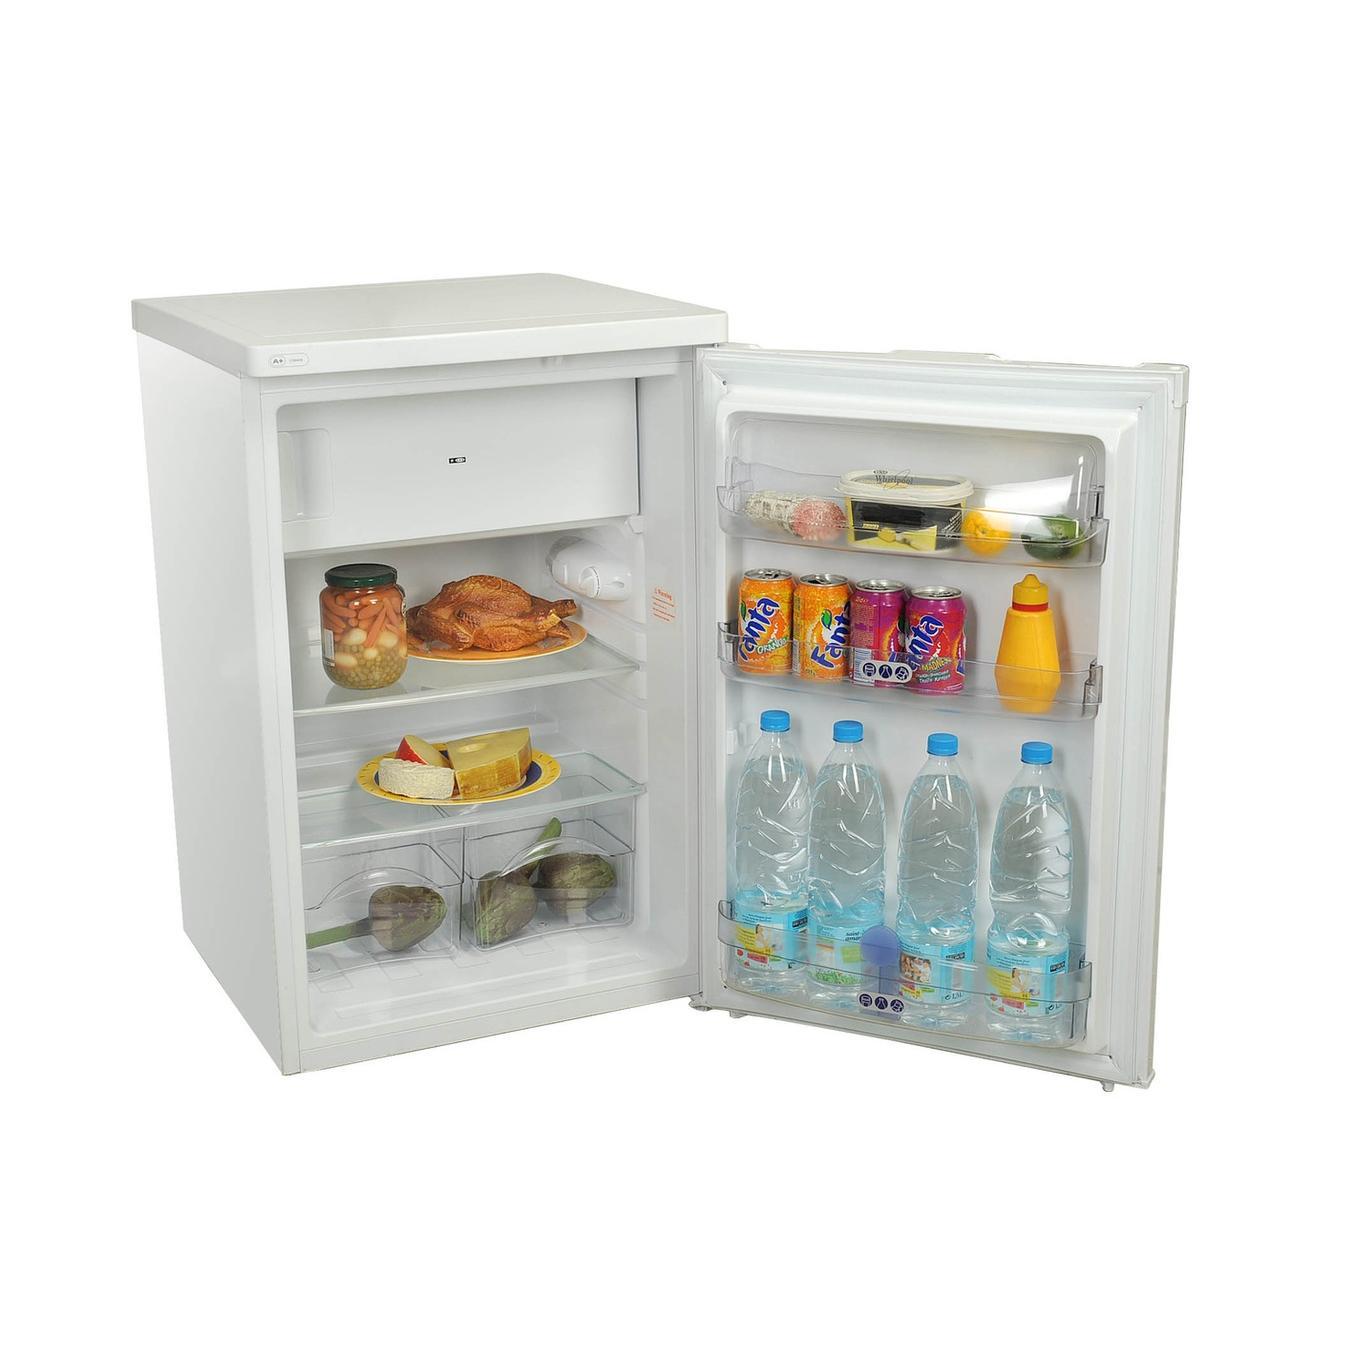 WHIRLPOOL - Réfrigérateur Top Freezer ARC 104/1/A+ - Blanc